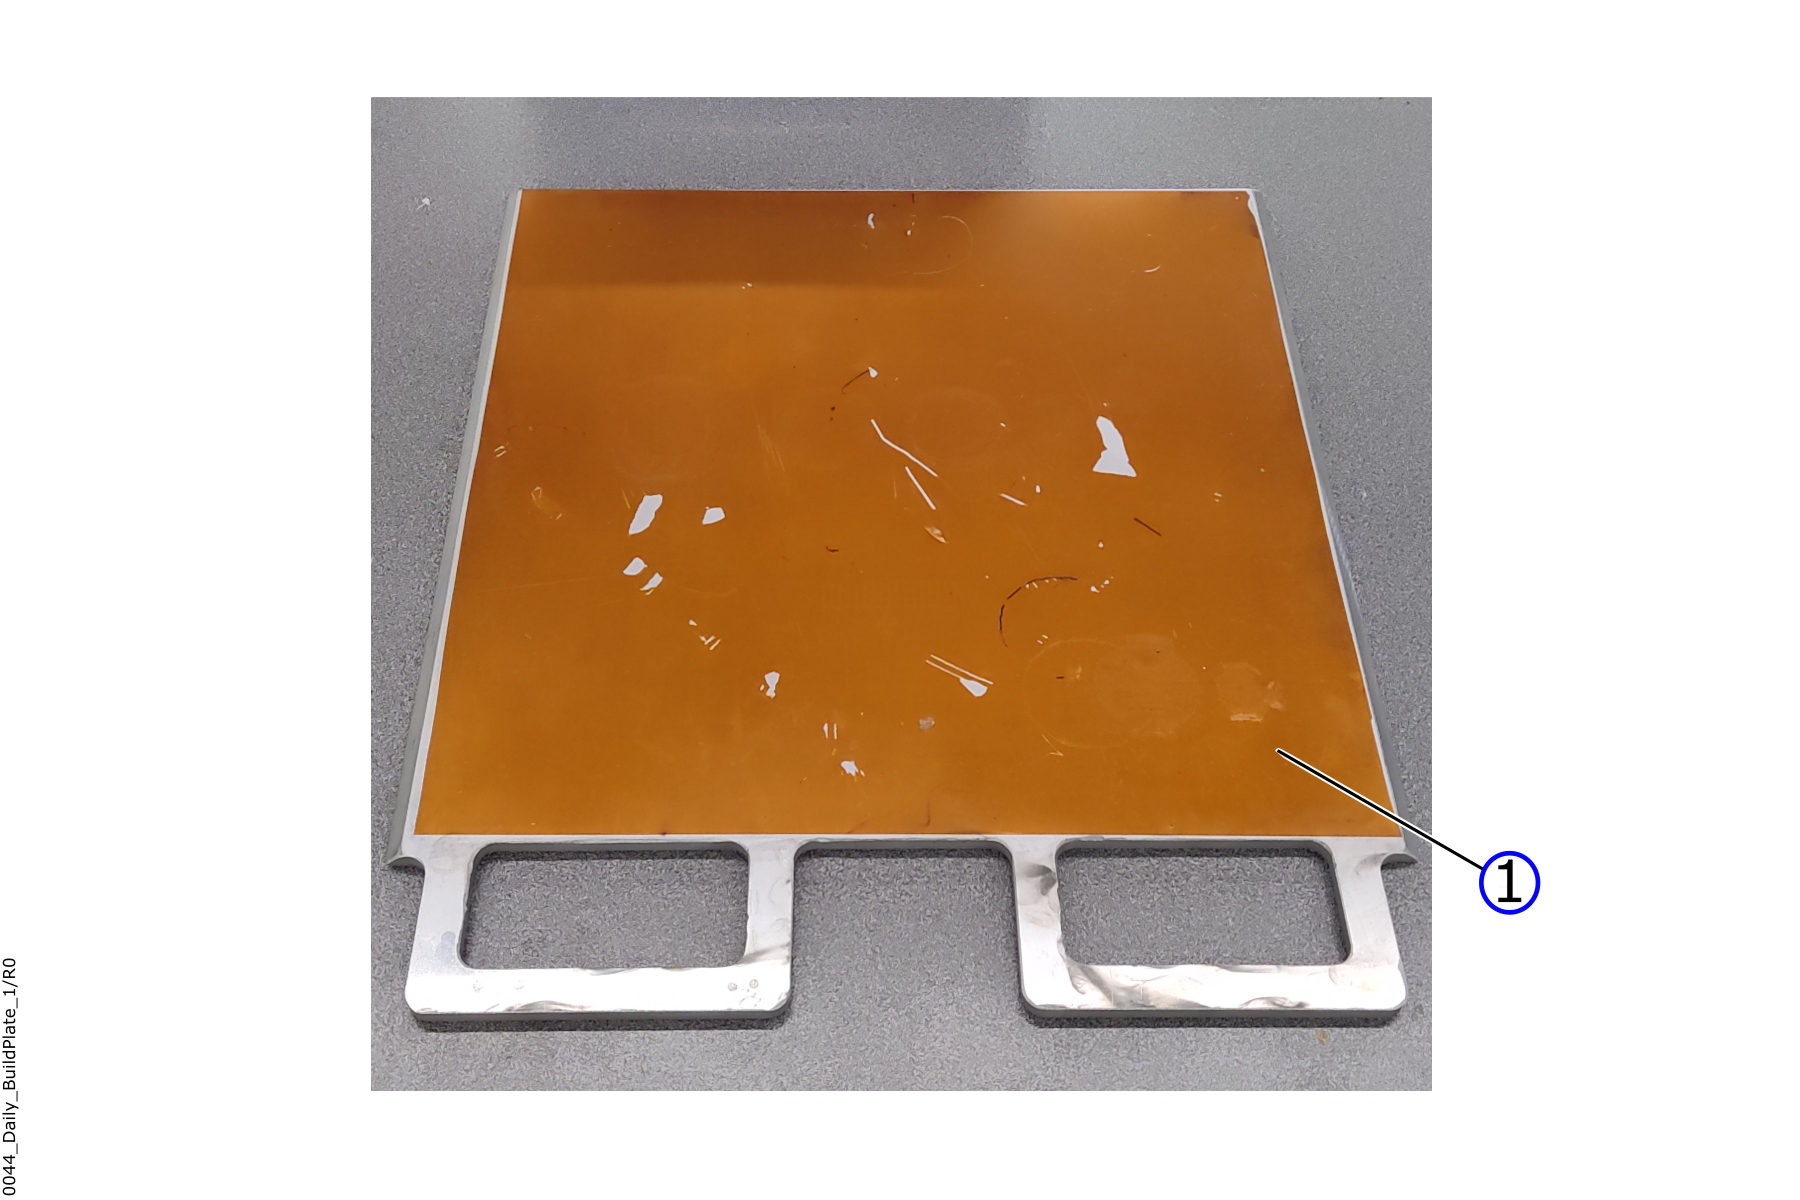 LT Build Plate